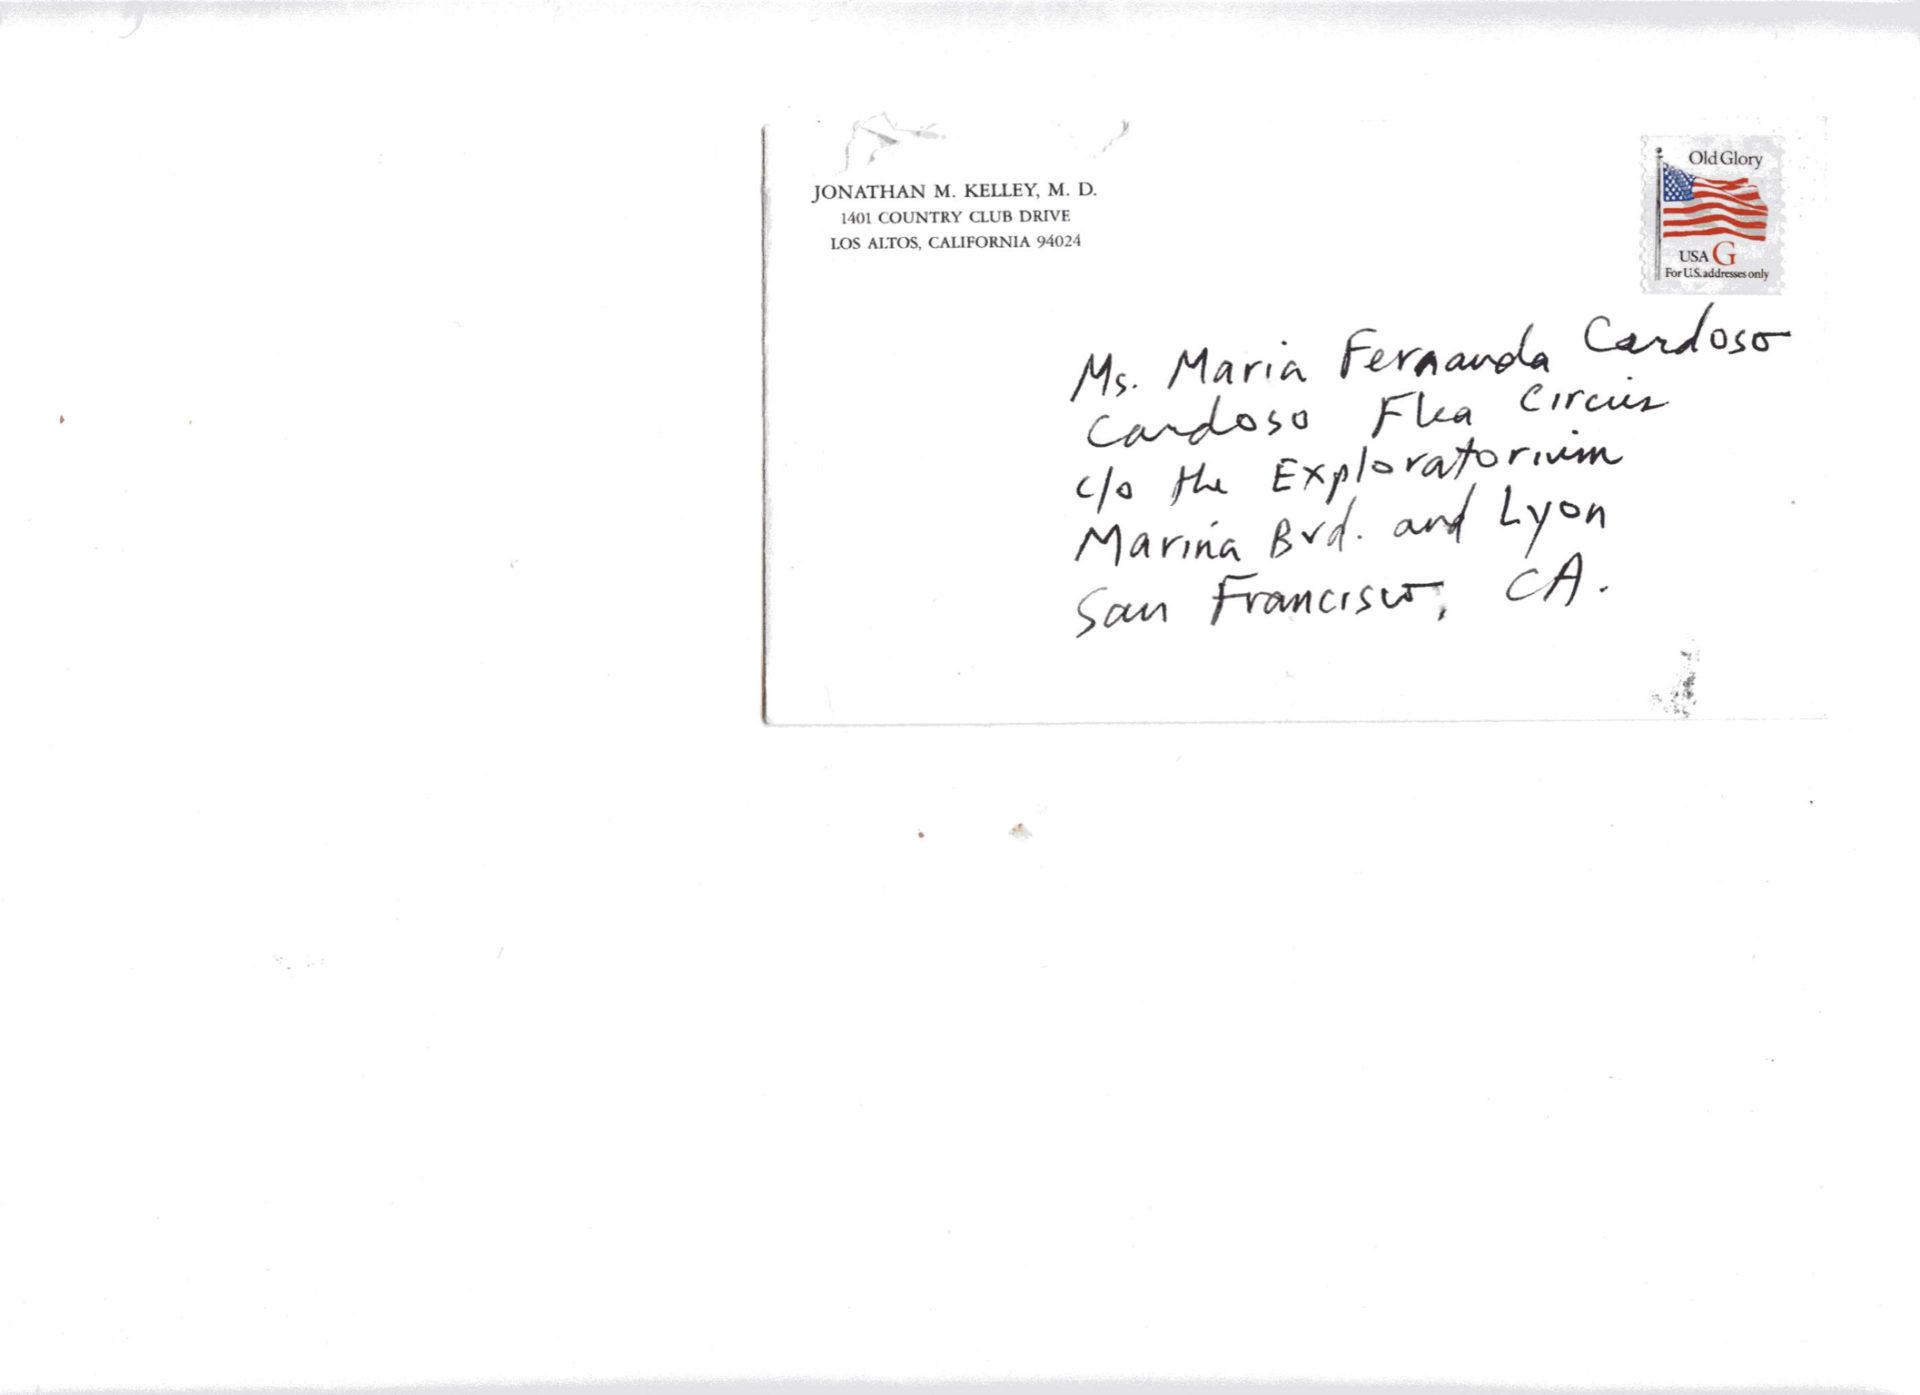 Jonathan M. Kelly Envelo038